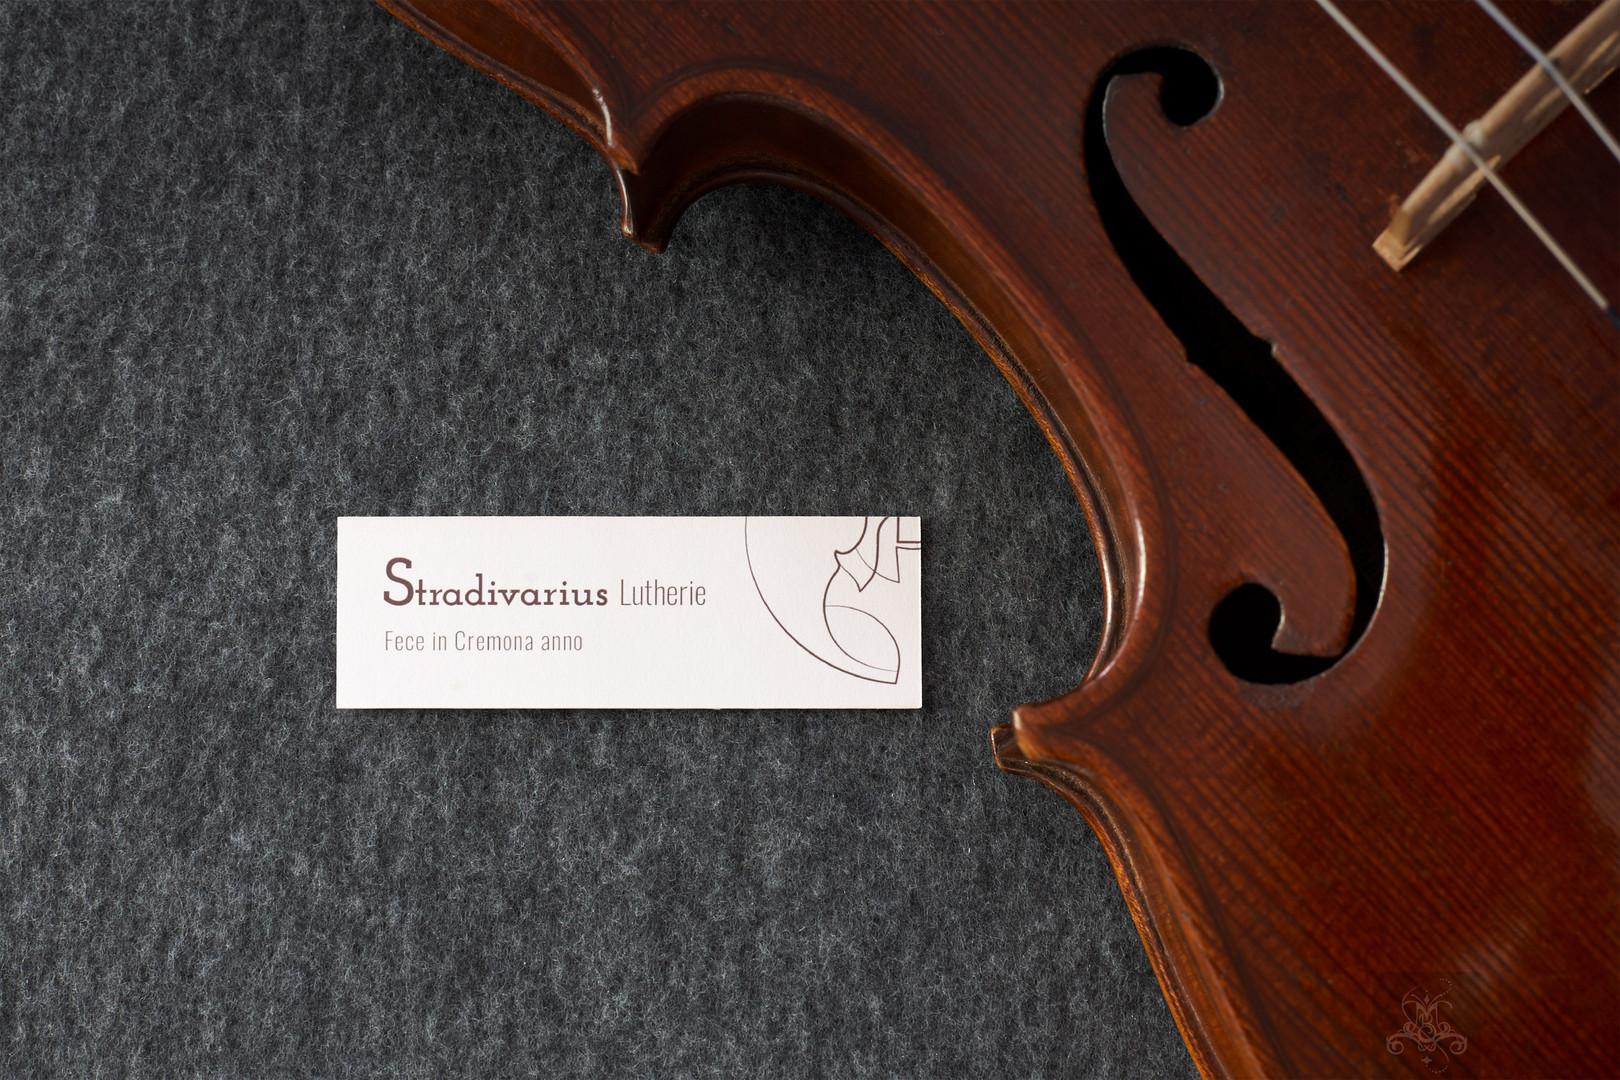 Stradivarius_lutherie_logo_design